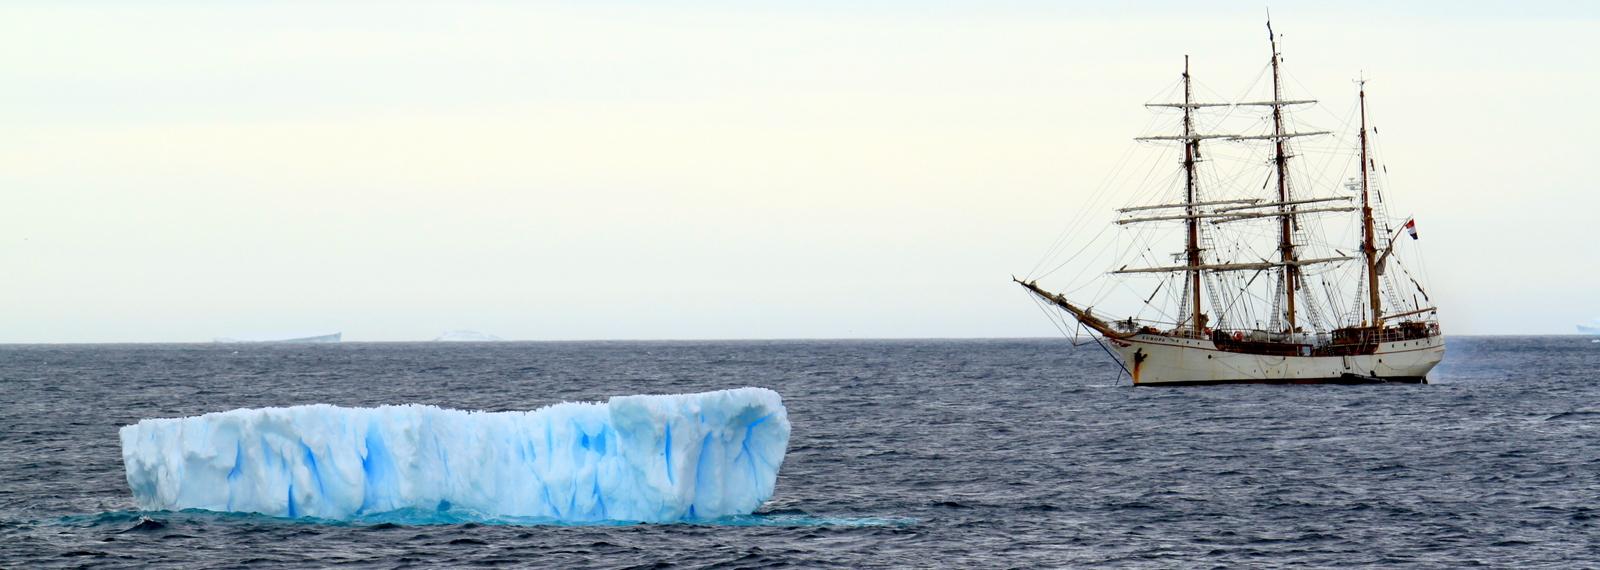 Antarctica, Paulet Island, Iceberg